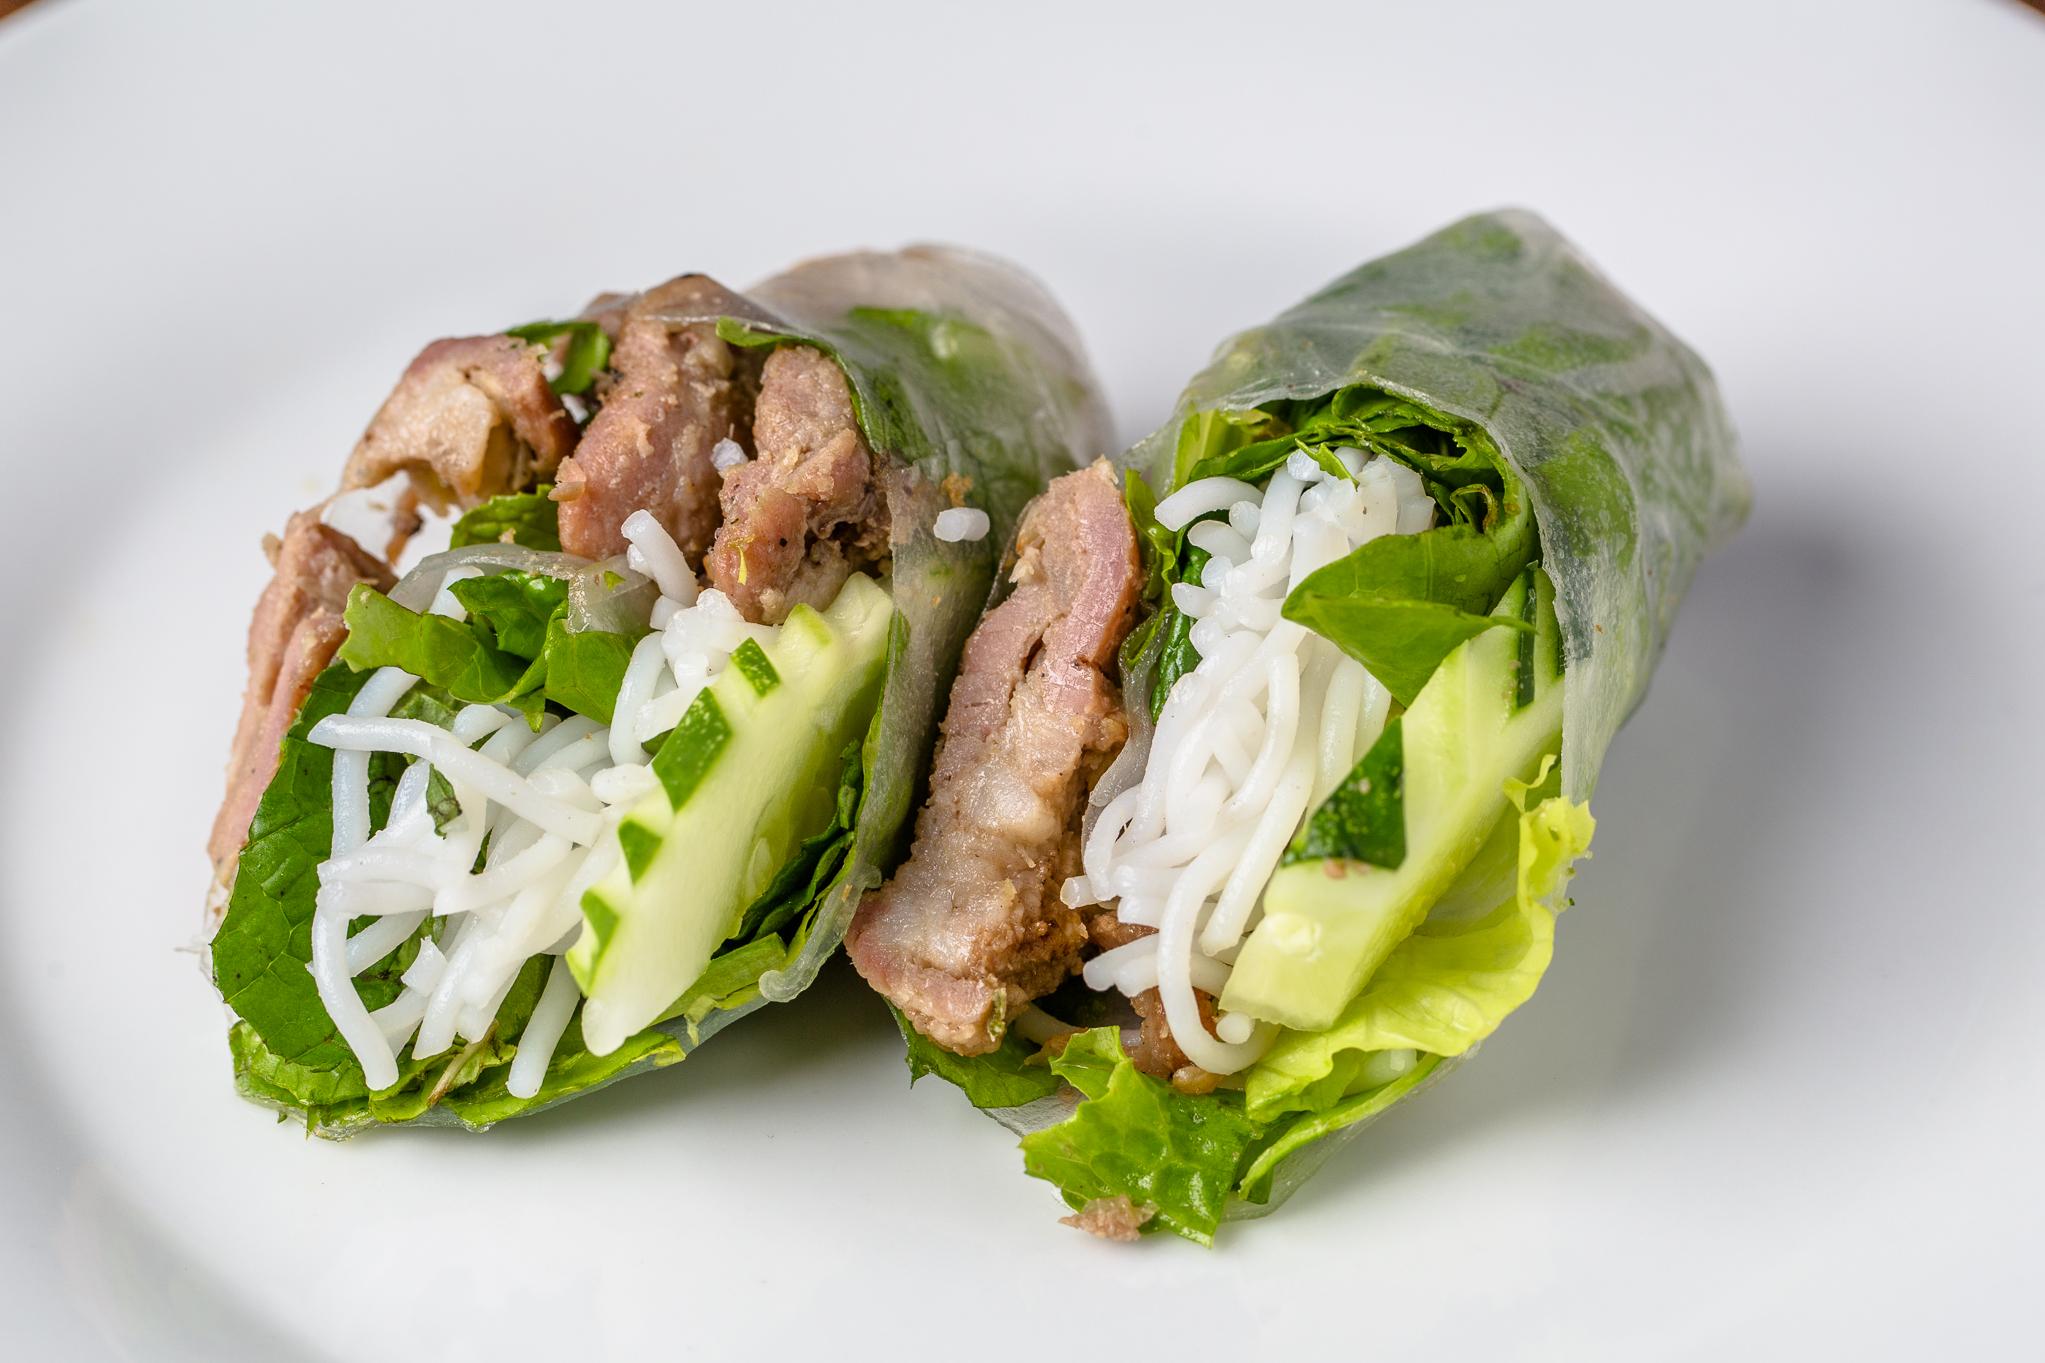 Bun Mi Pork Spring Roll